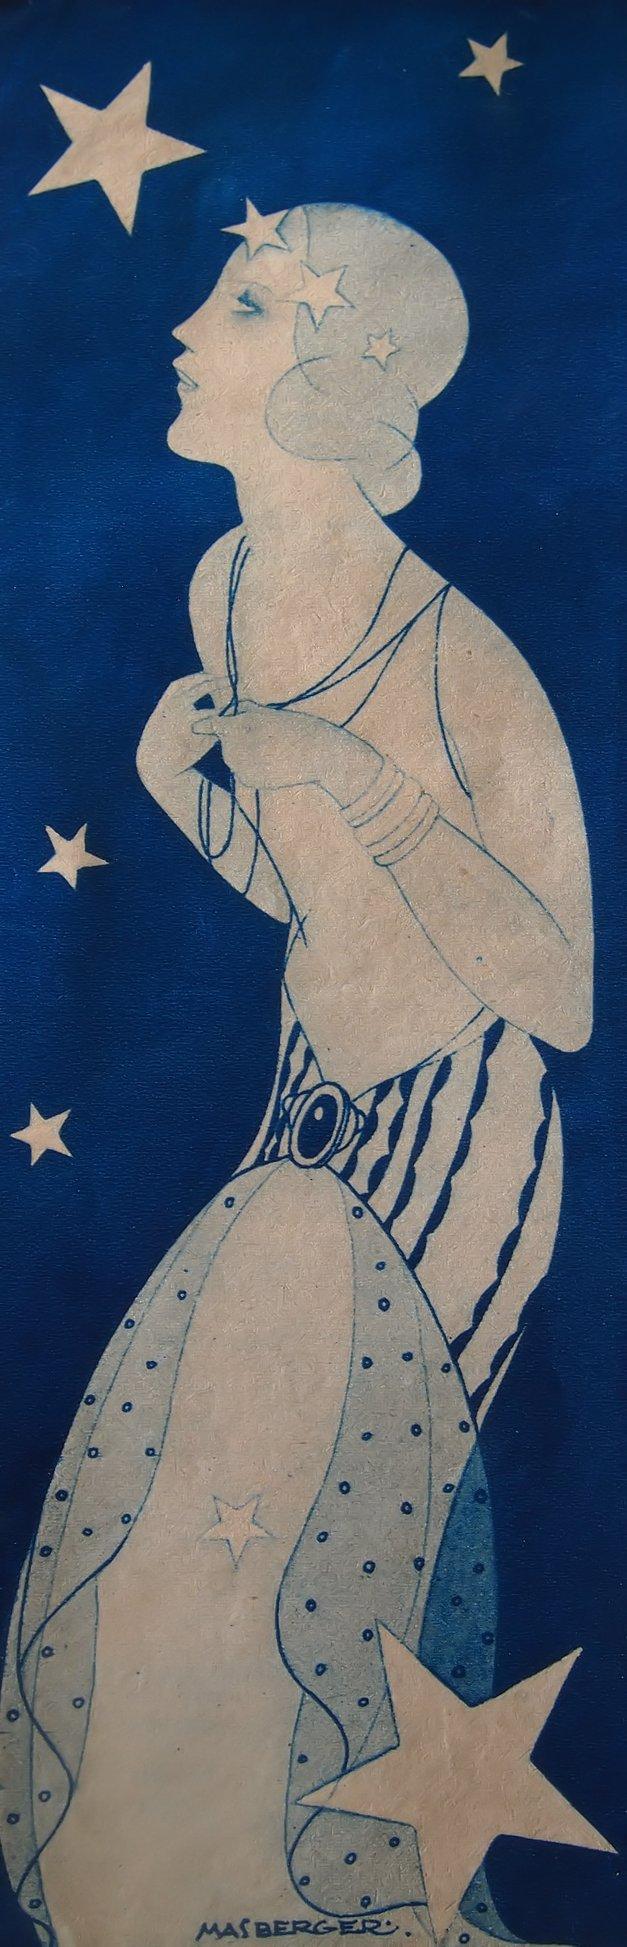 Art deco illustration by carlos masberger 1935 gente for Art deco illustration